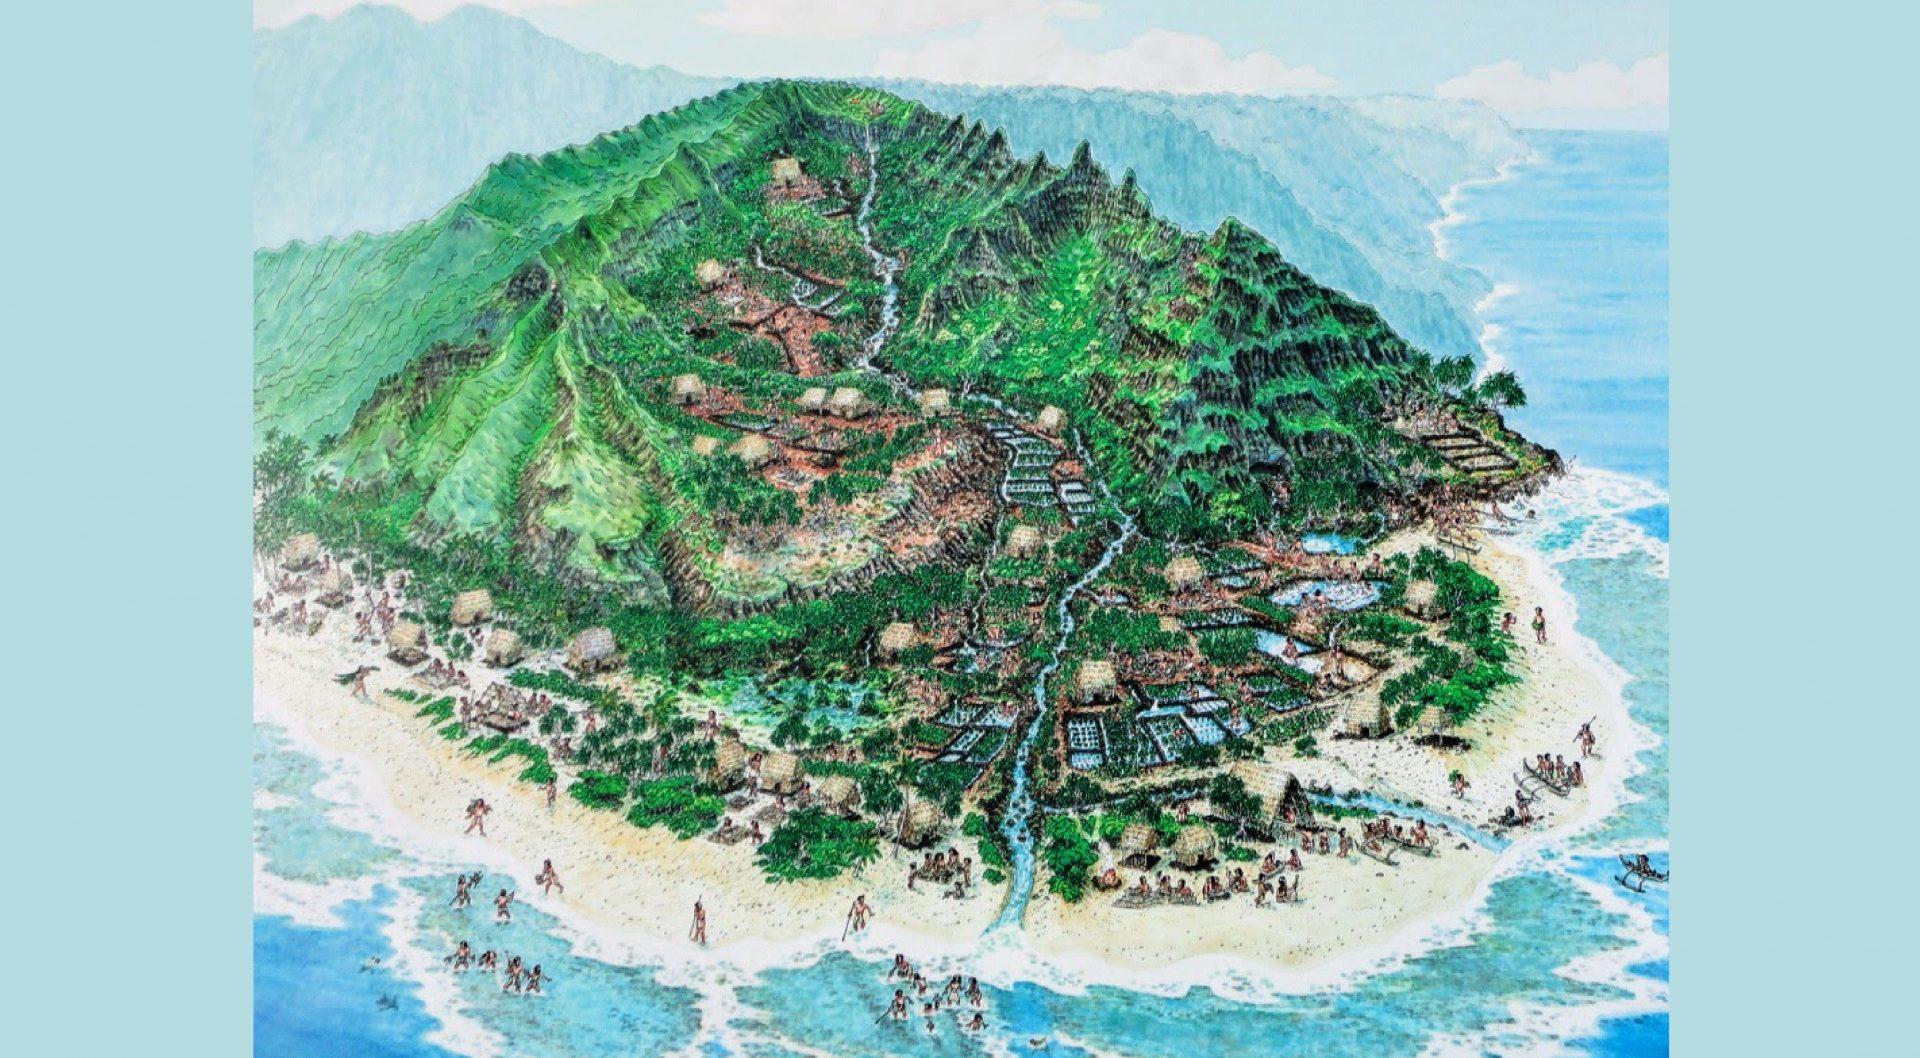 Ahupua'a: 夏威夷永續的土地實踐